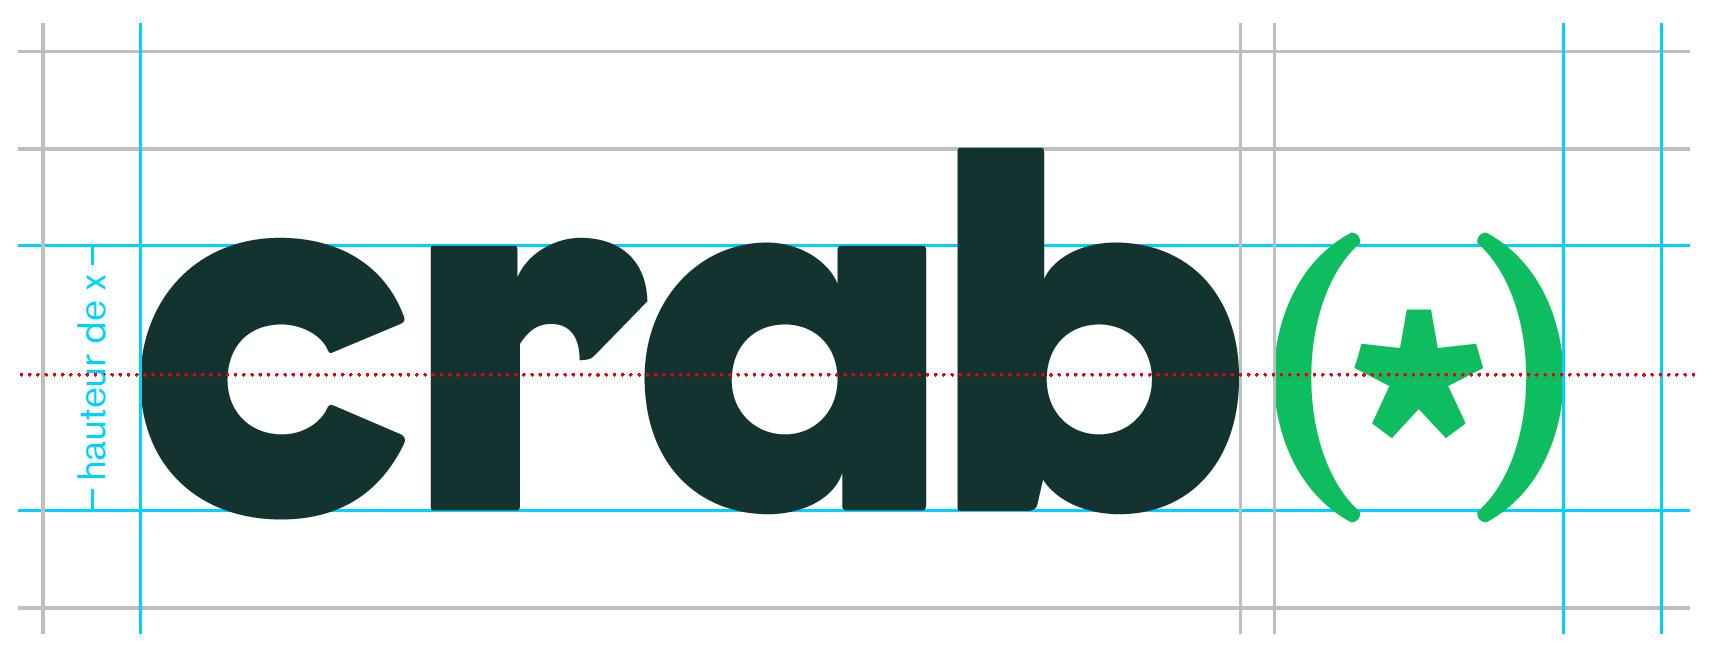 vlevle-crab-logo-graphic_design-gaelle_de_laveleye